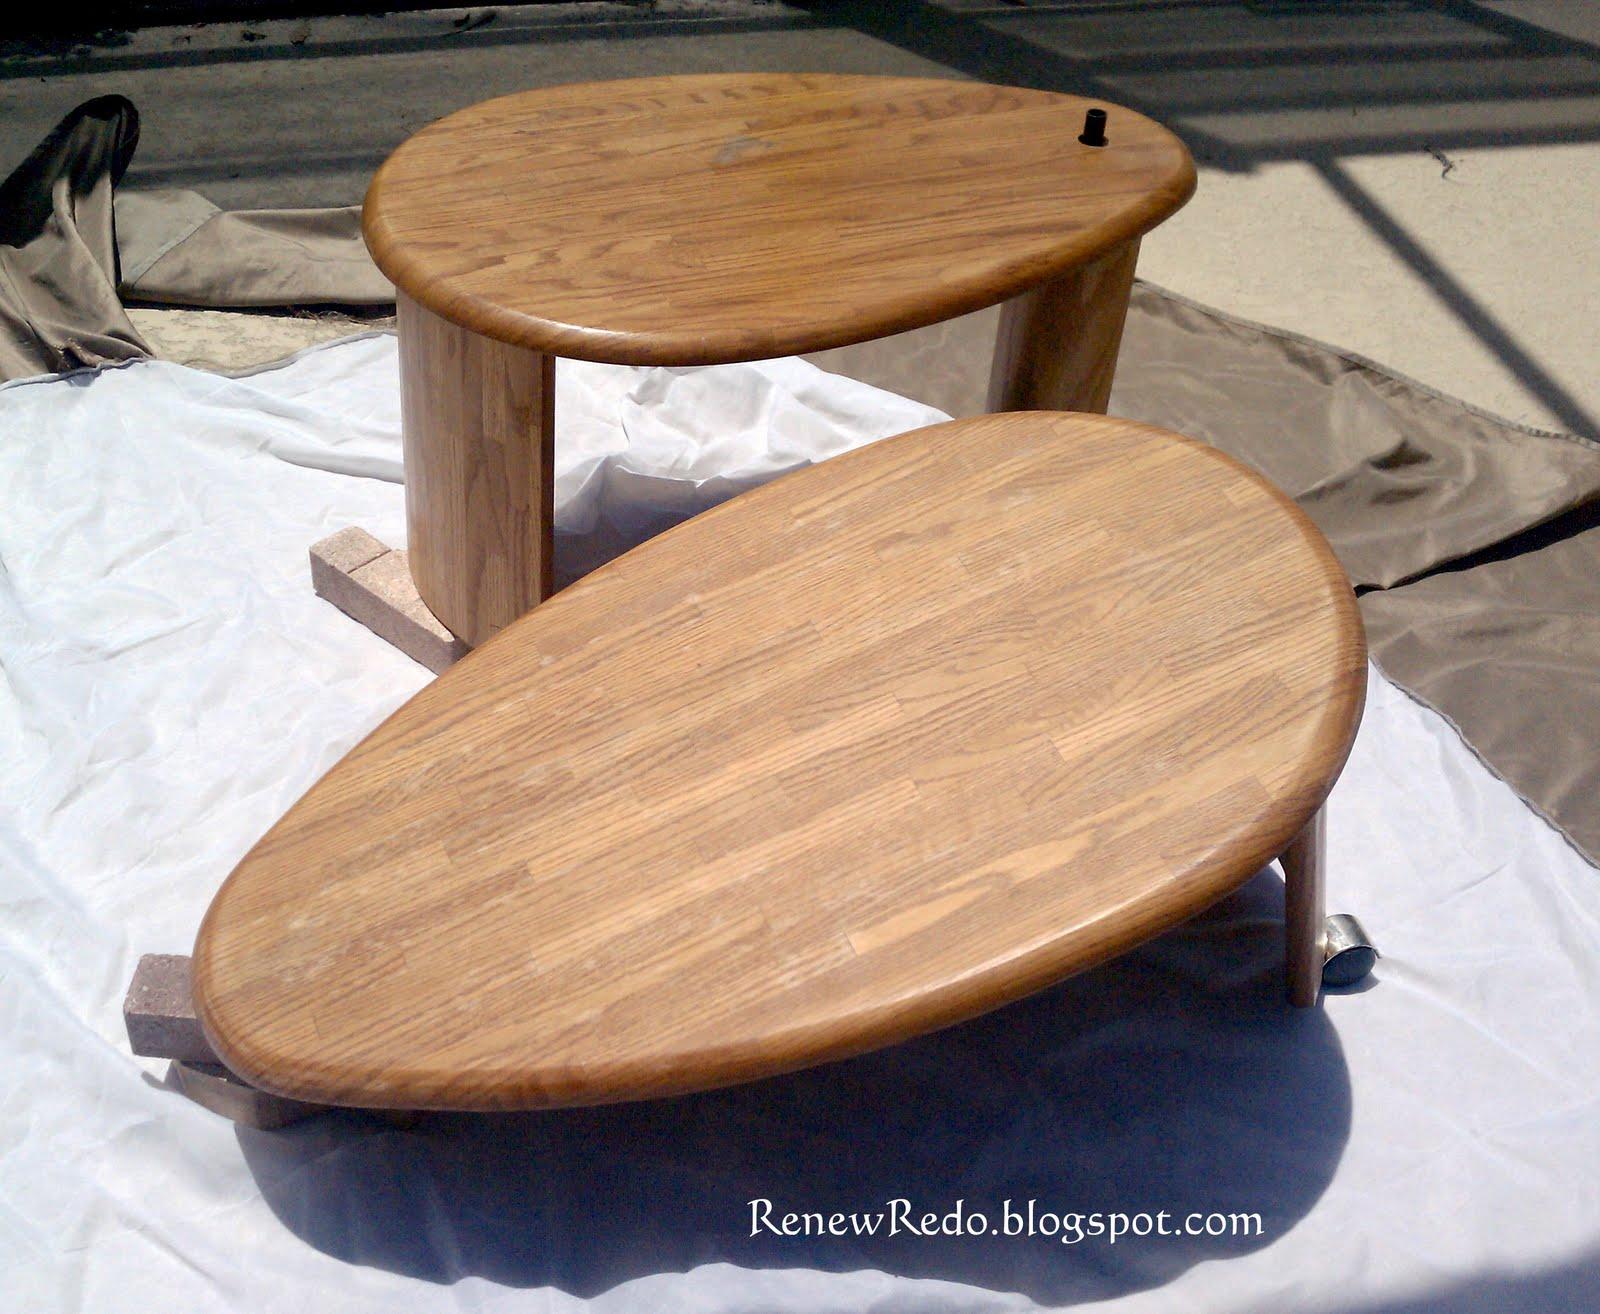 ReNew ReDo!: Coffee Table Redo With Ottoman